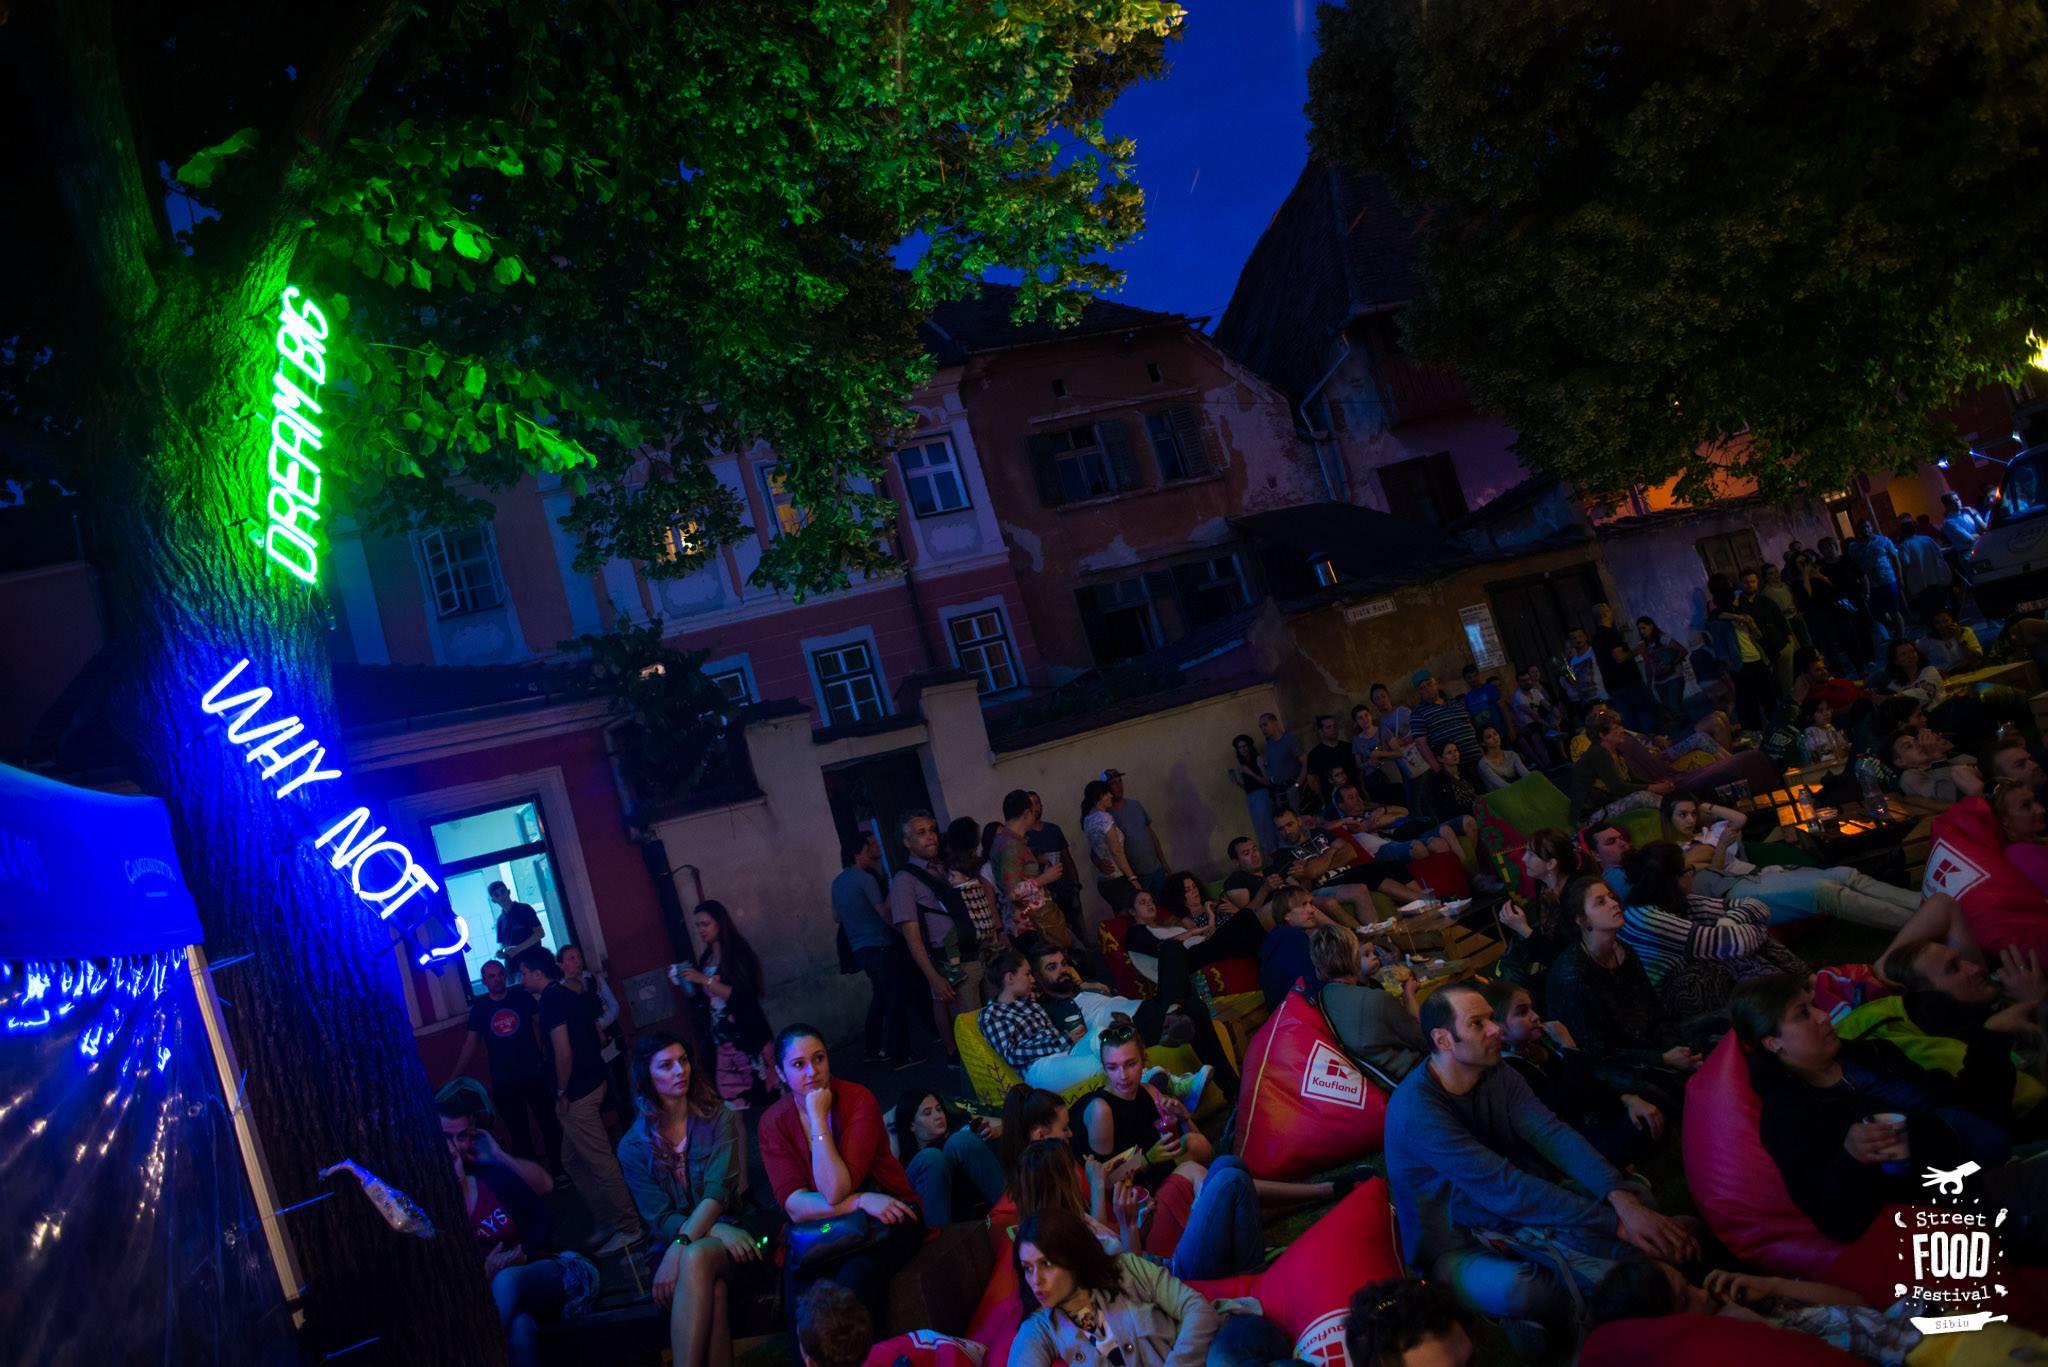 street-food-festival-2017-11.jpg